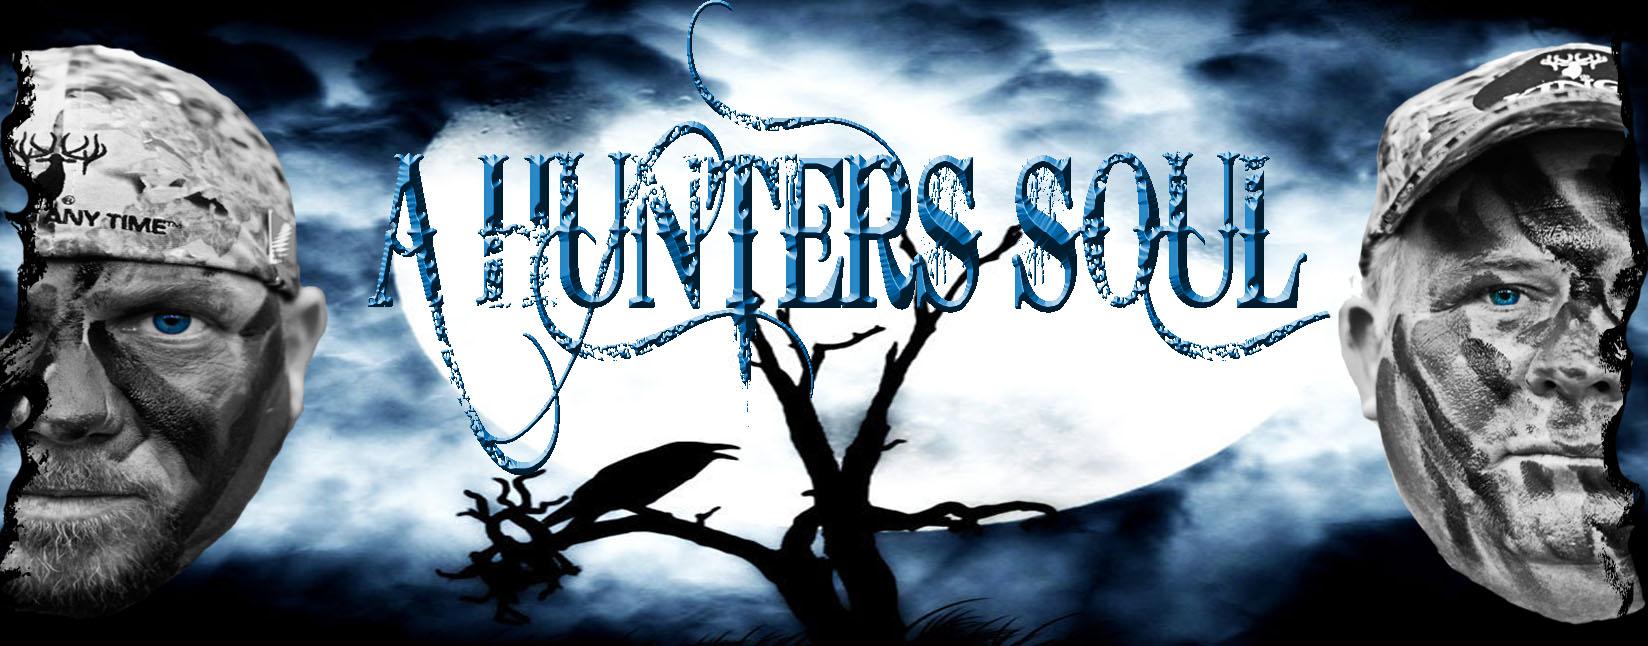 hunters soul.jpg